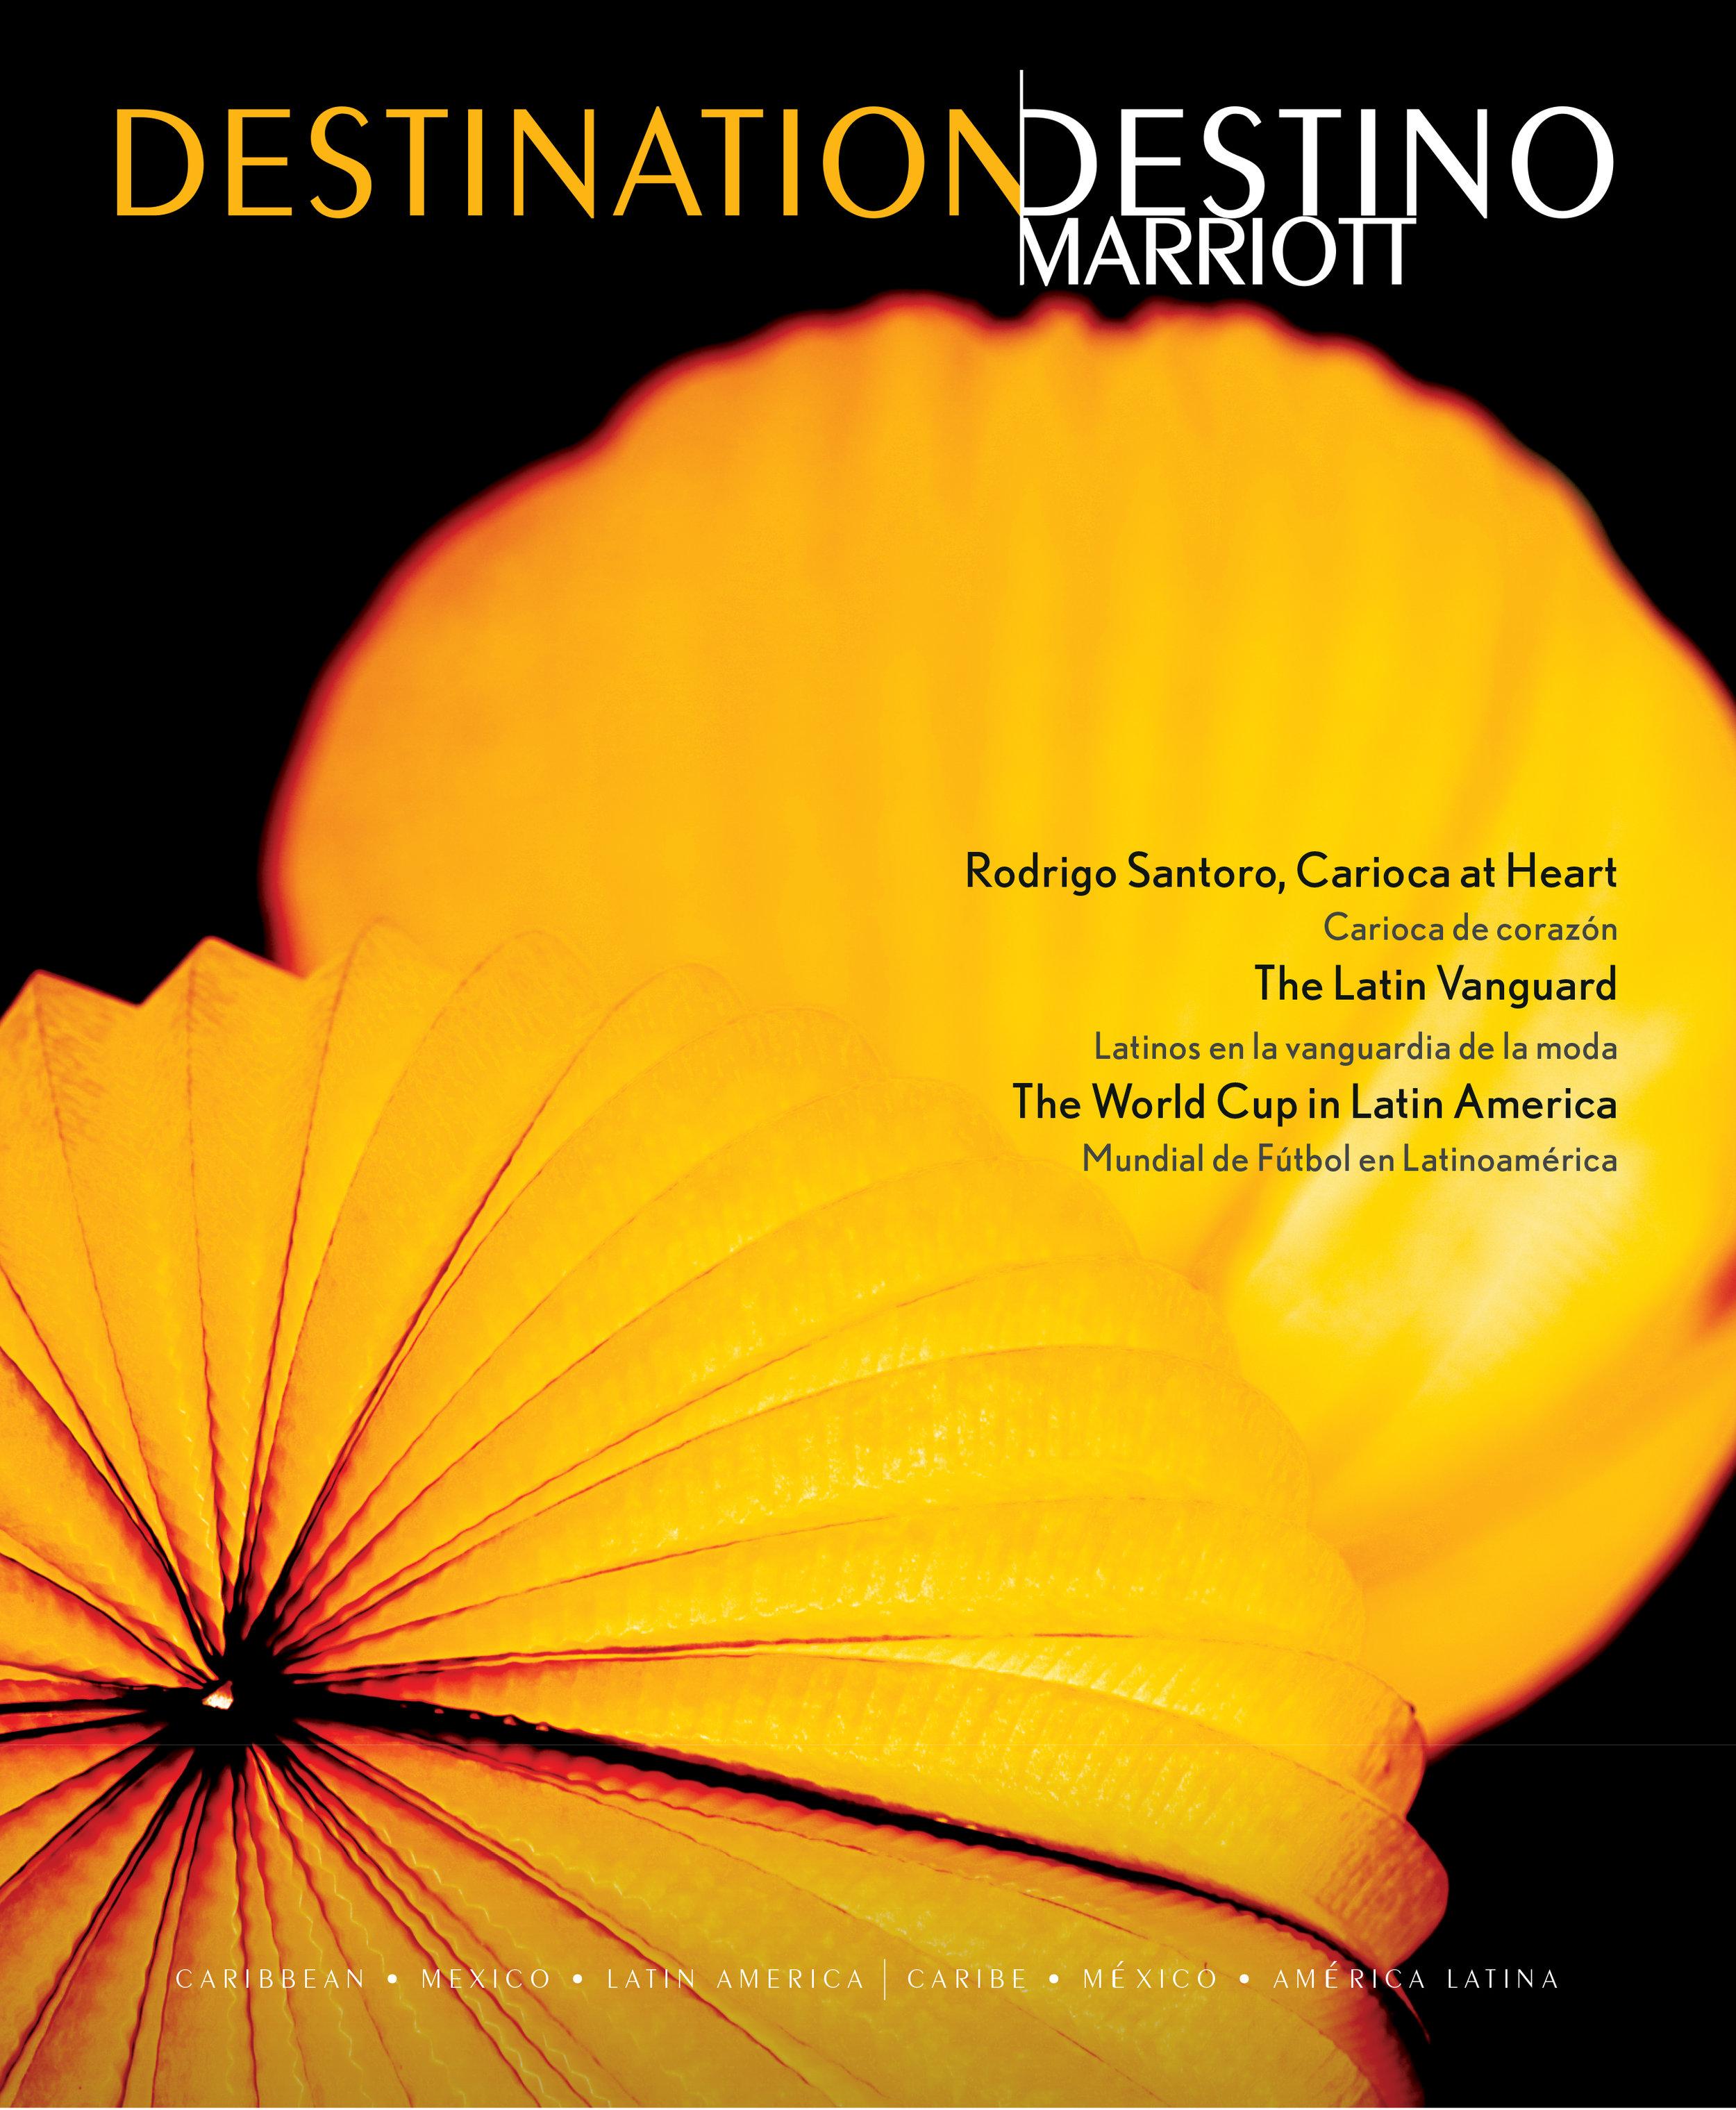 Destination/Destino Marriott